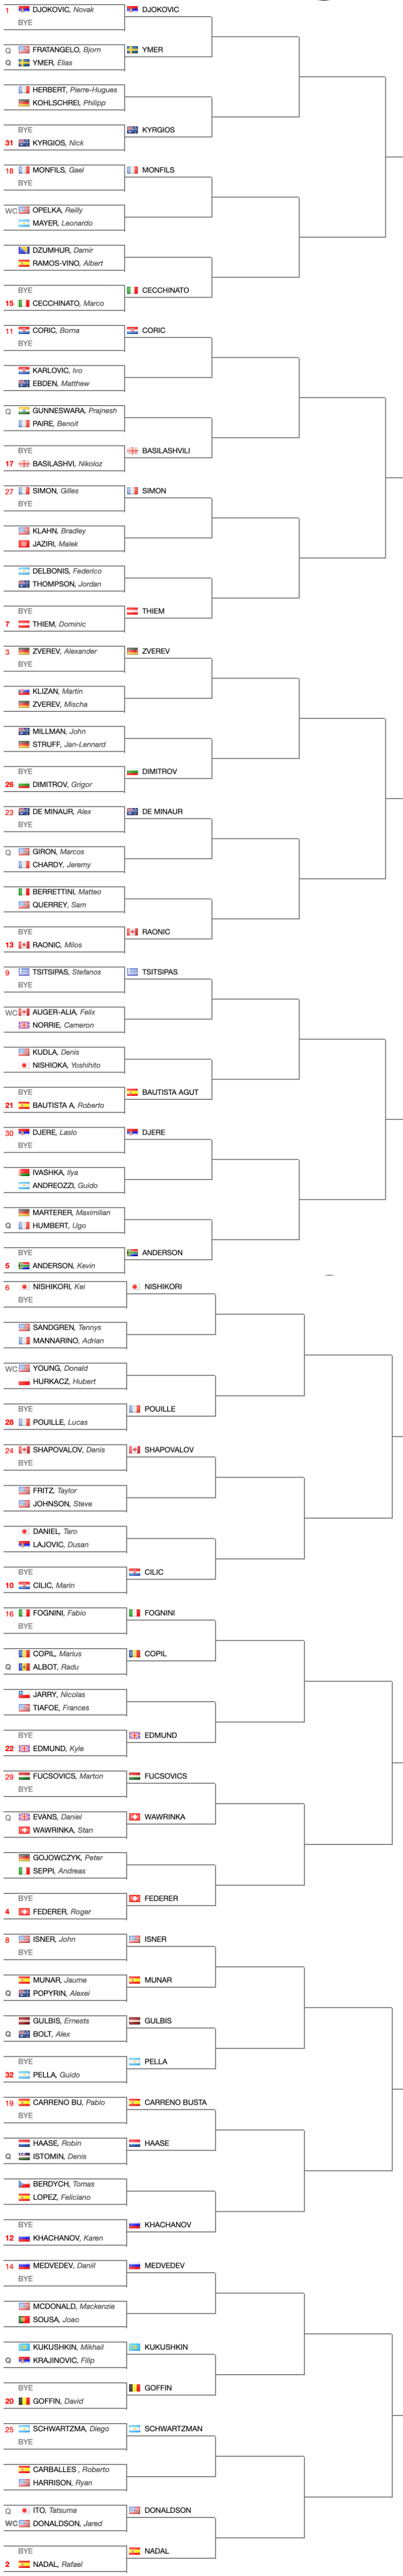 Tabellone-principale-Indian-Wells-ATP-2019